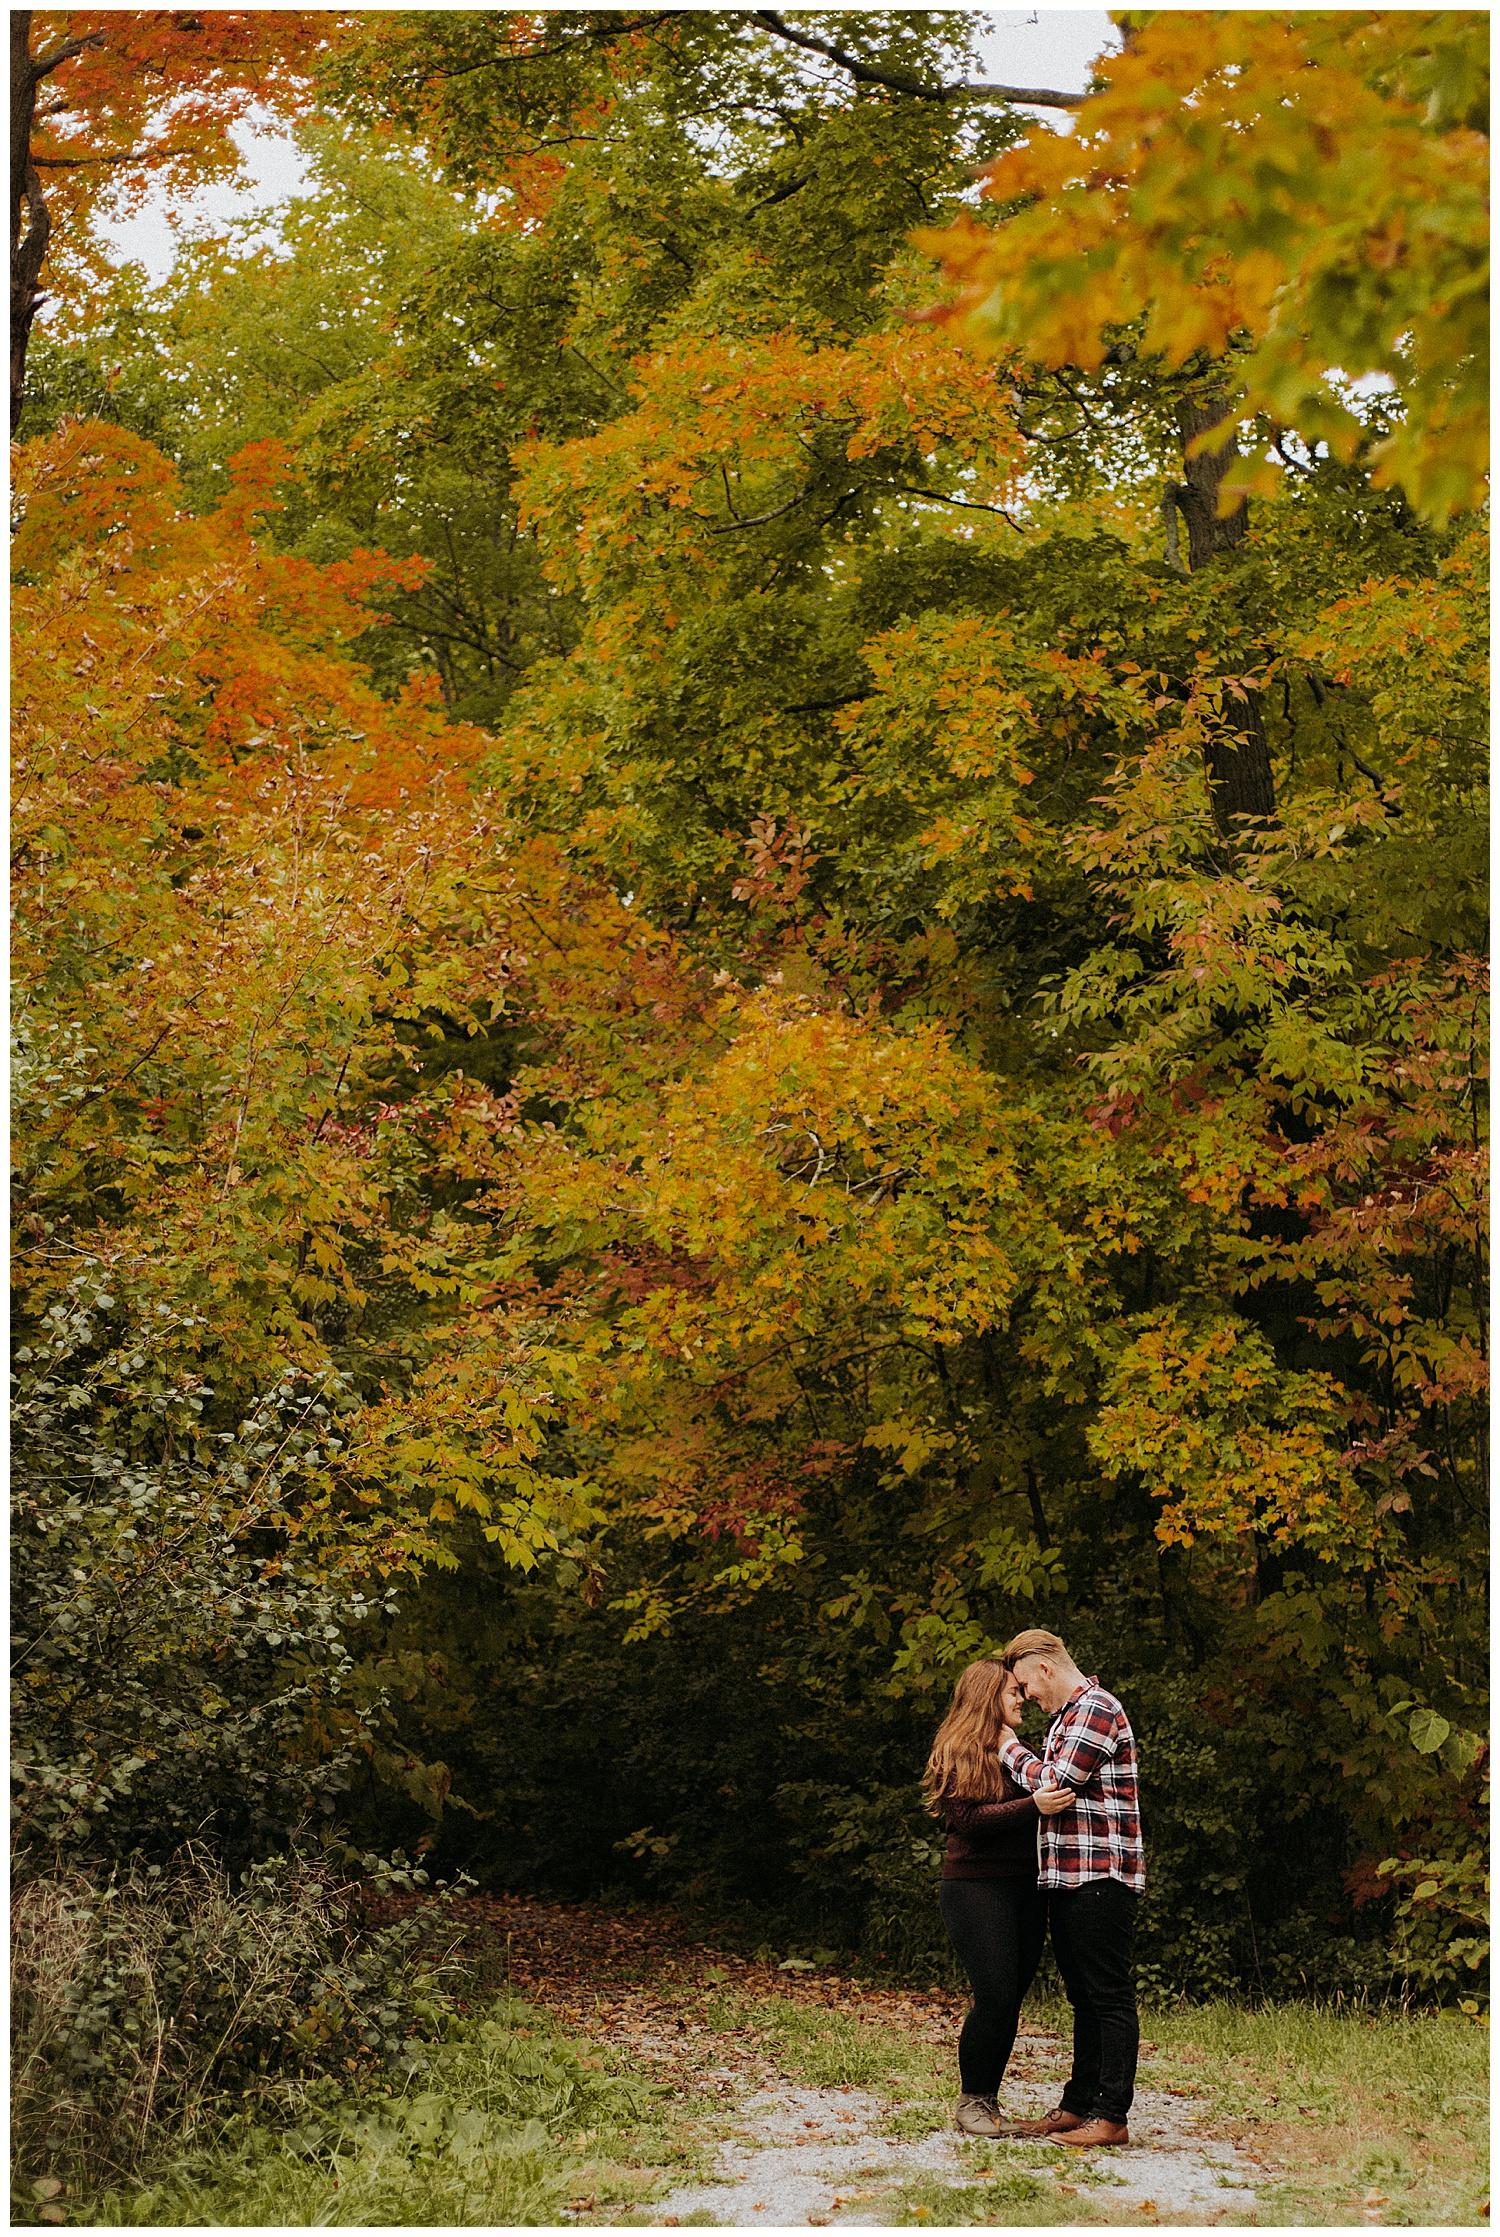 Holly McMurter Photographs | Prince Edward County | Fall Mini Session_0011.jpg